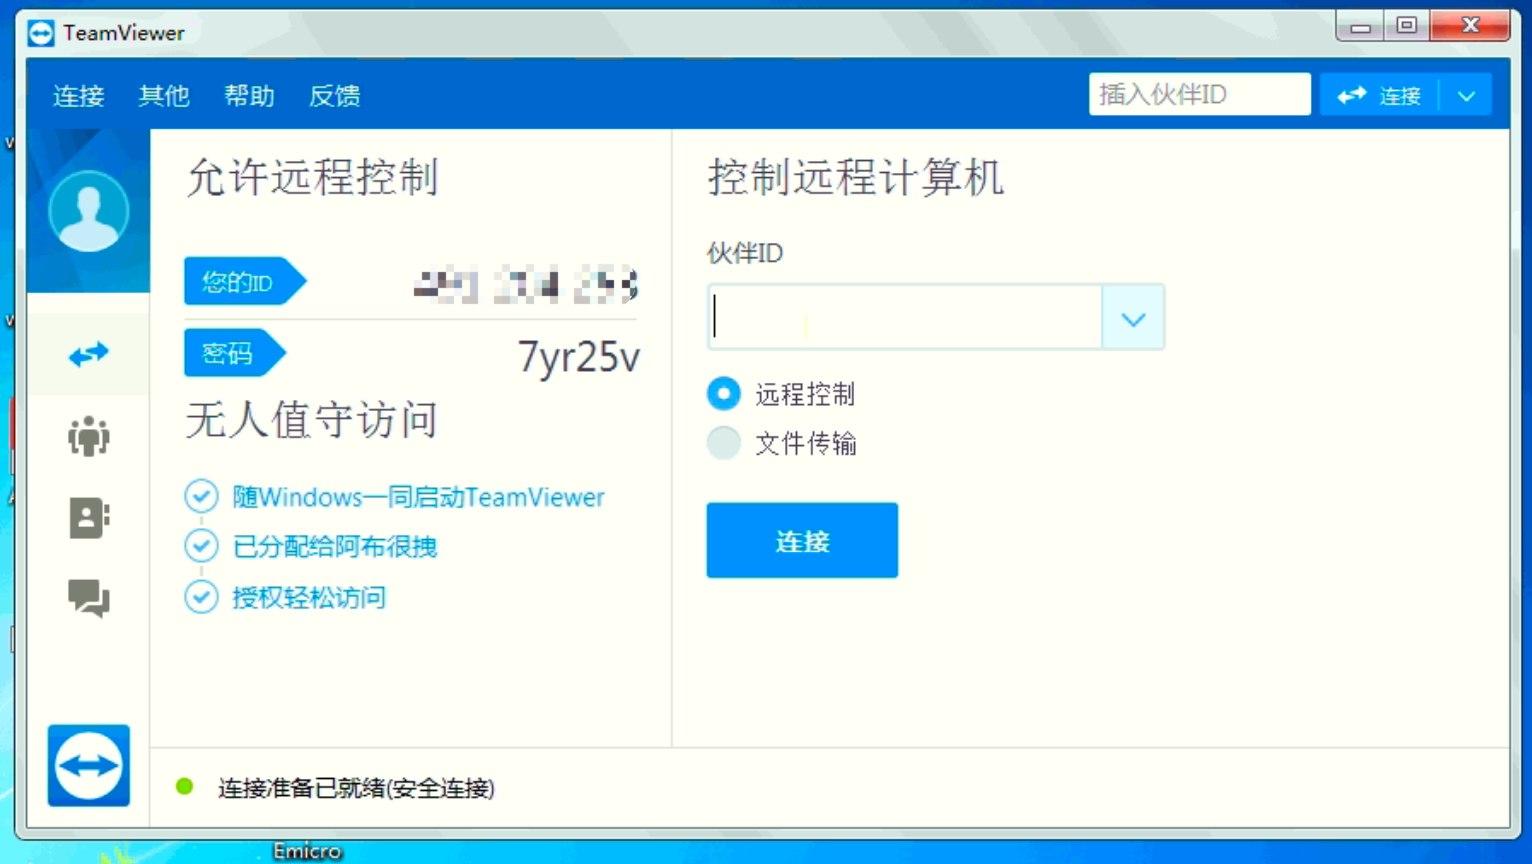 TeamViewer(Mac|Windows) 開心版 无限更换ID